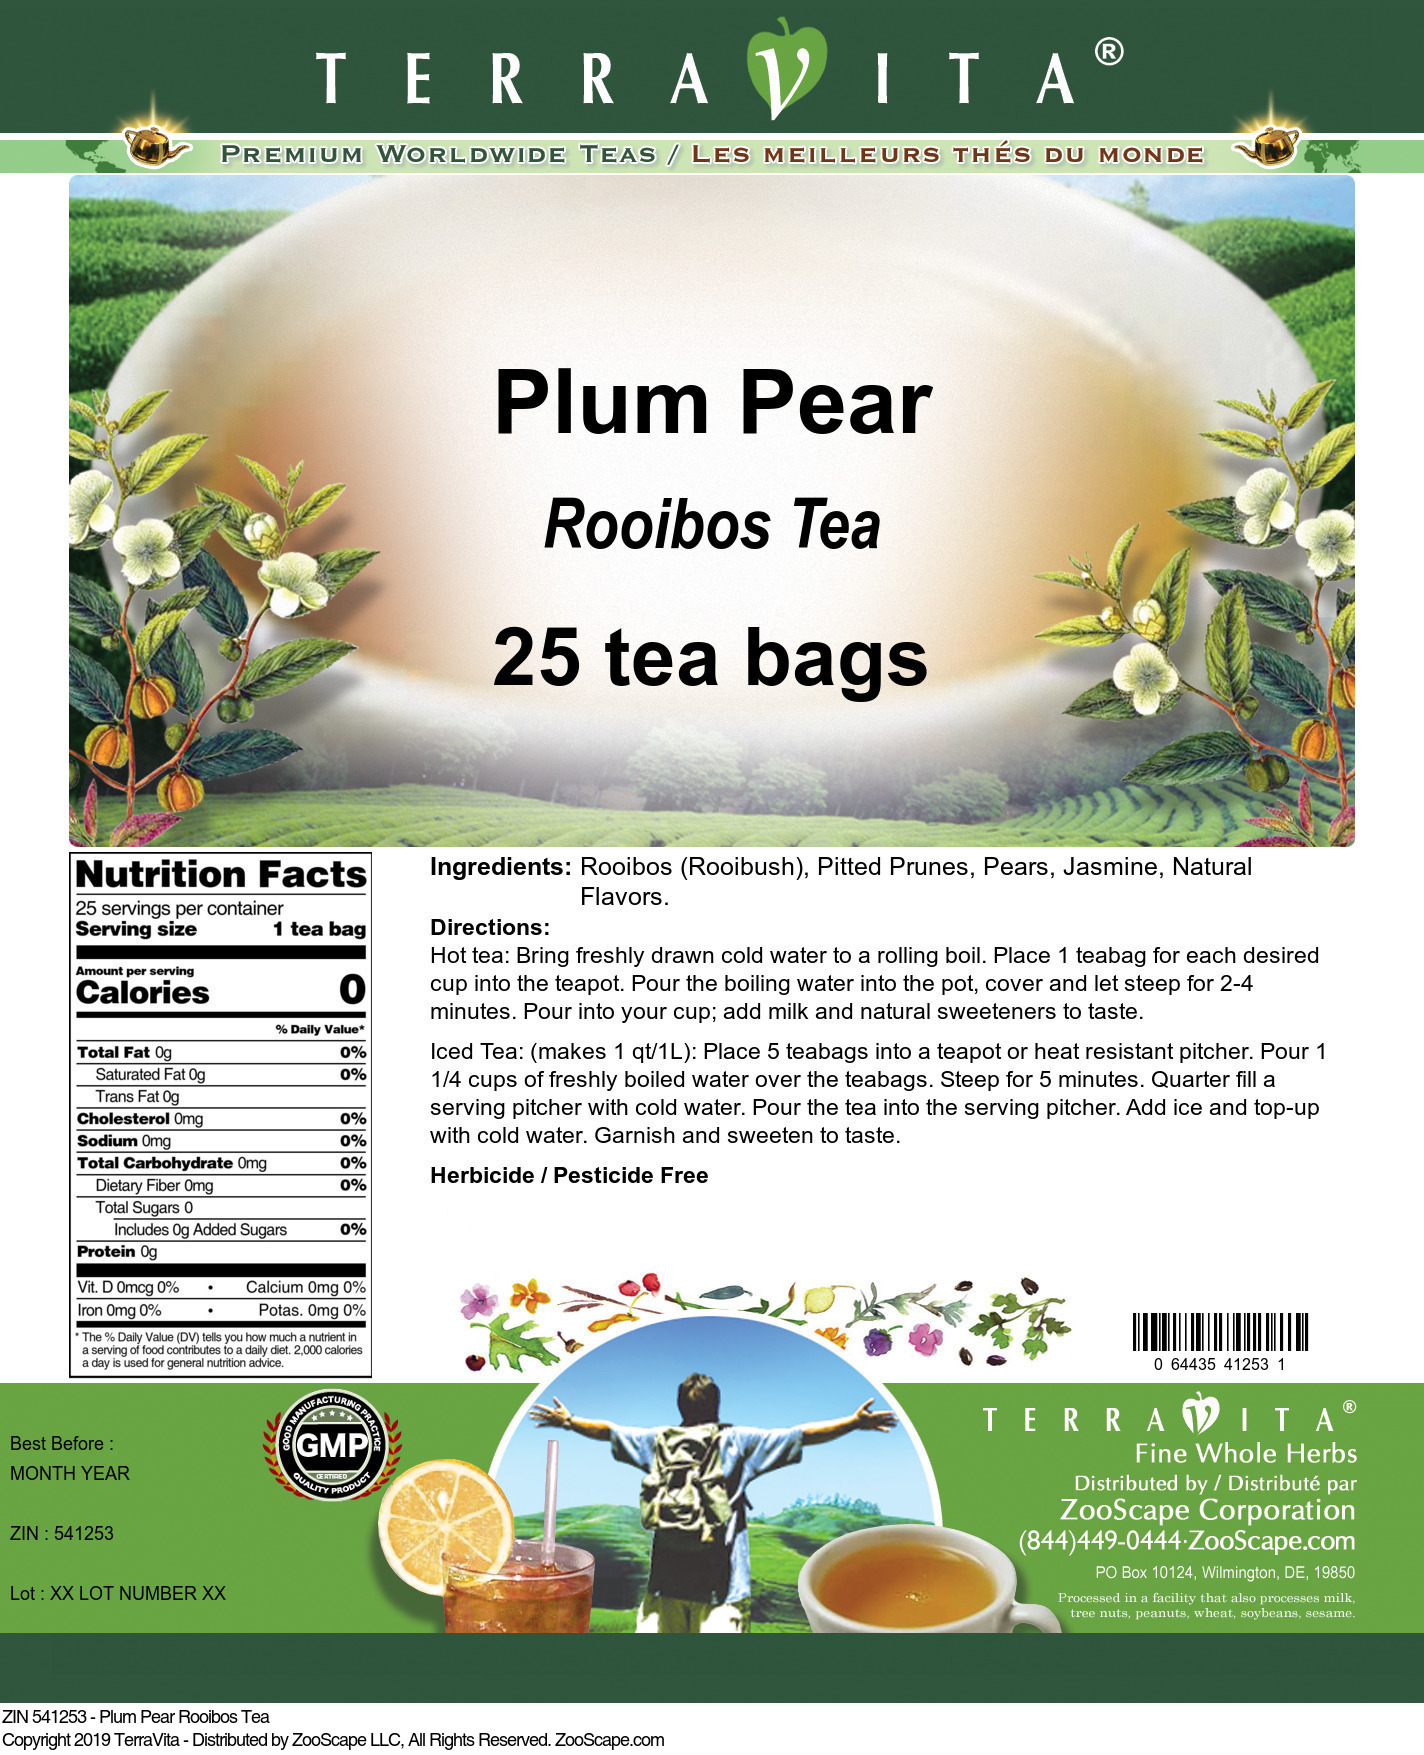 Plum Pear Rooibos Tea